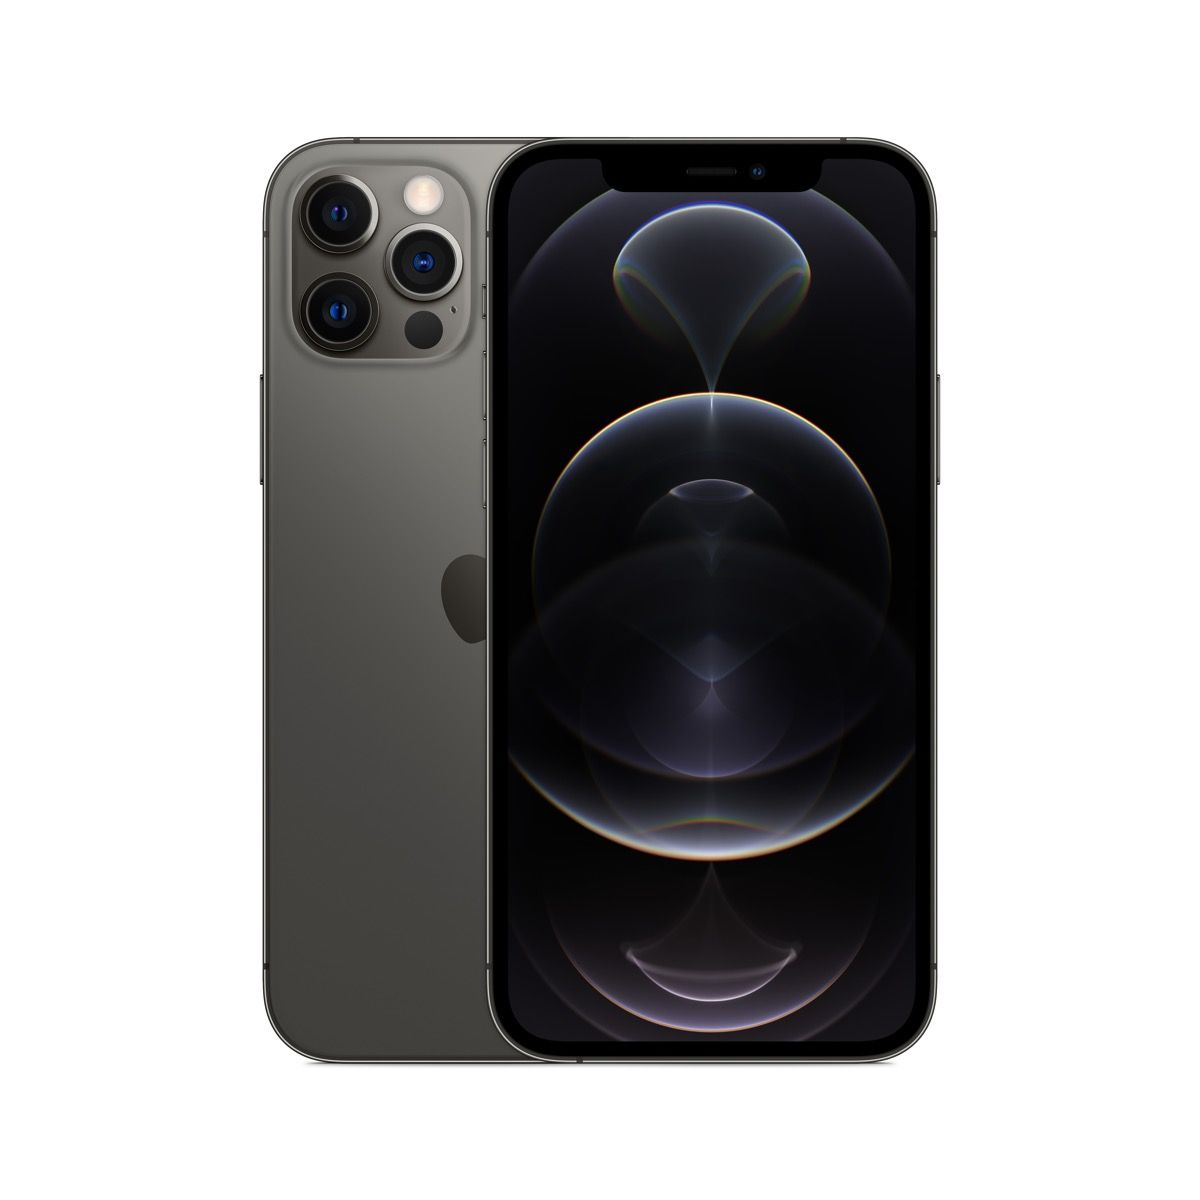 Apple iPhone 12 Pro Max 256GB Graphite / SK